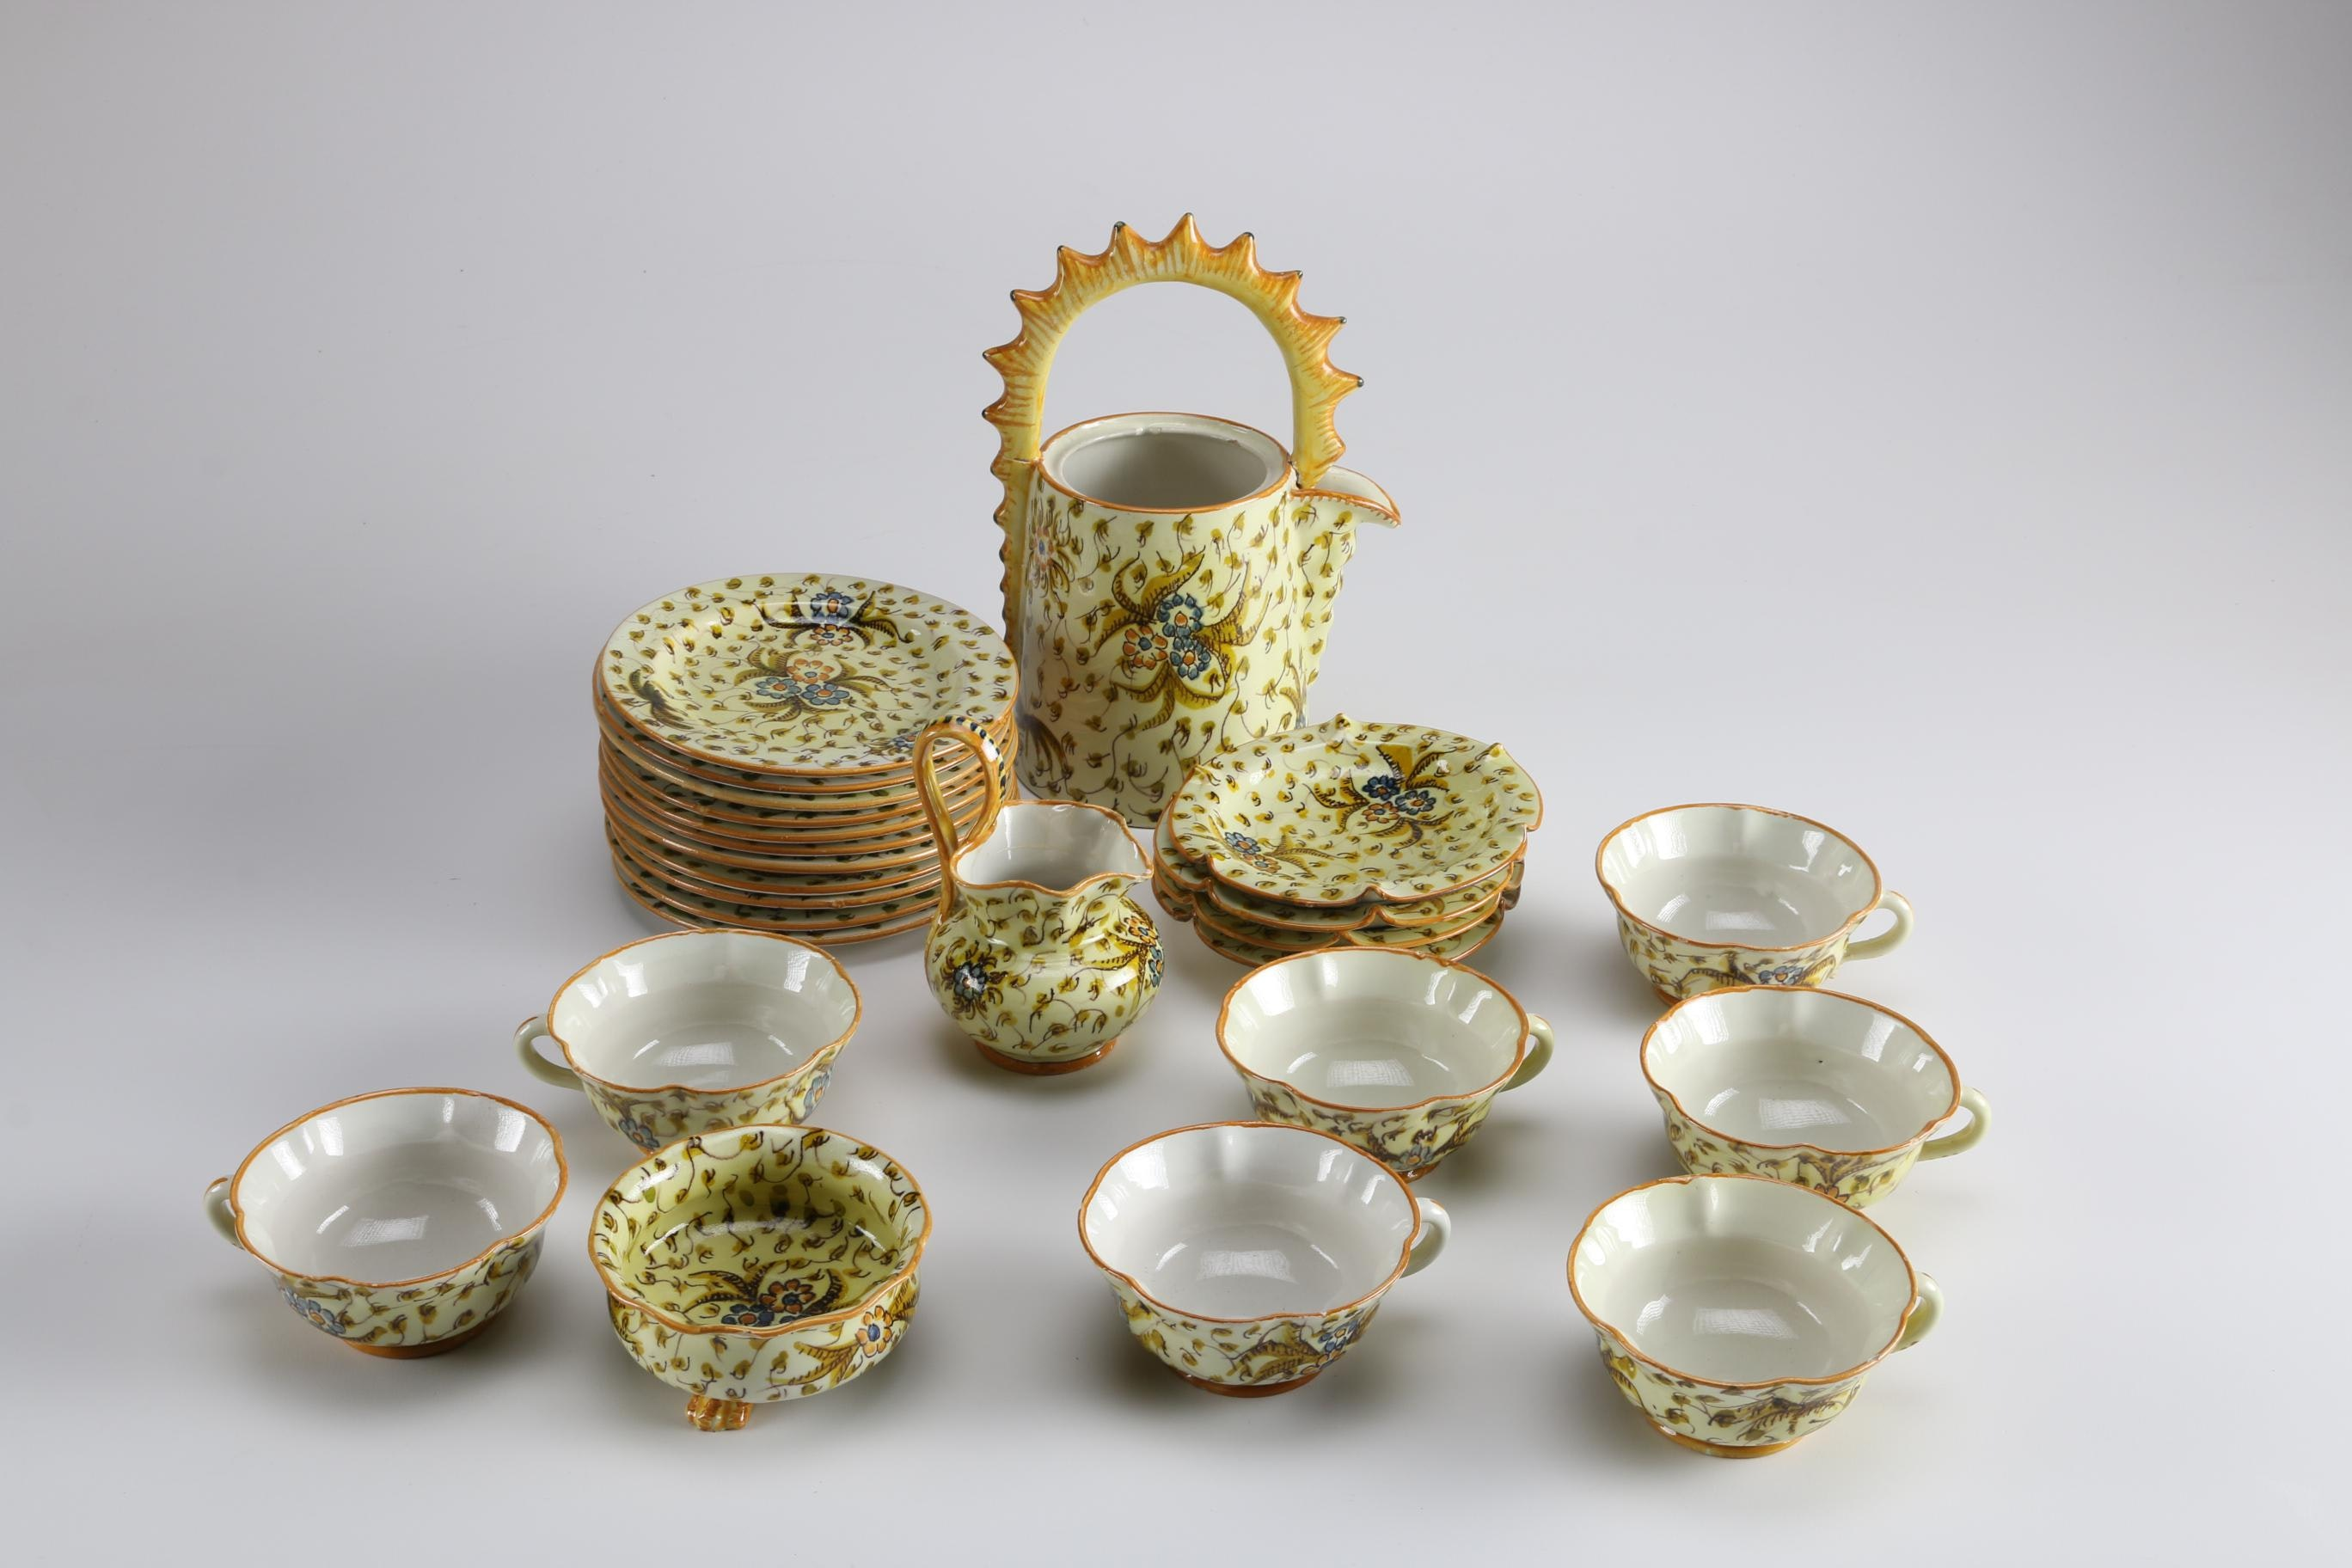 Hand-Painted Italian Cantagalli Floral Tea Set